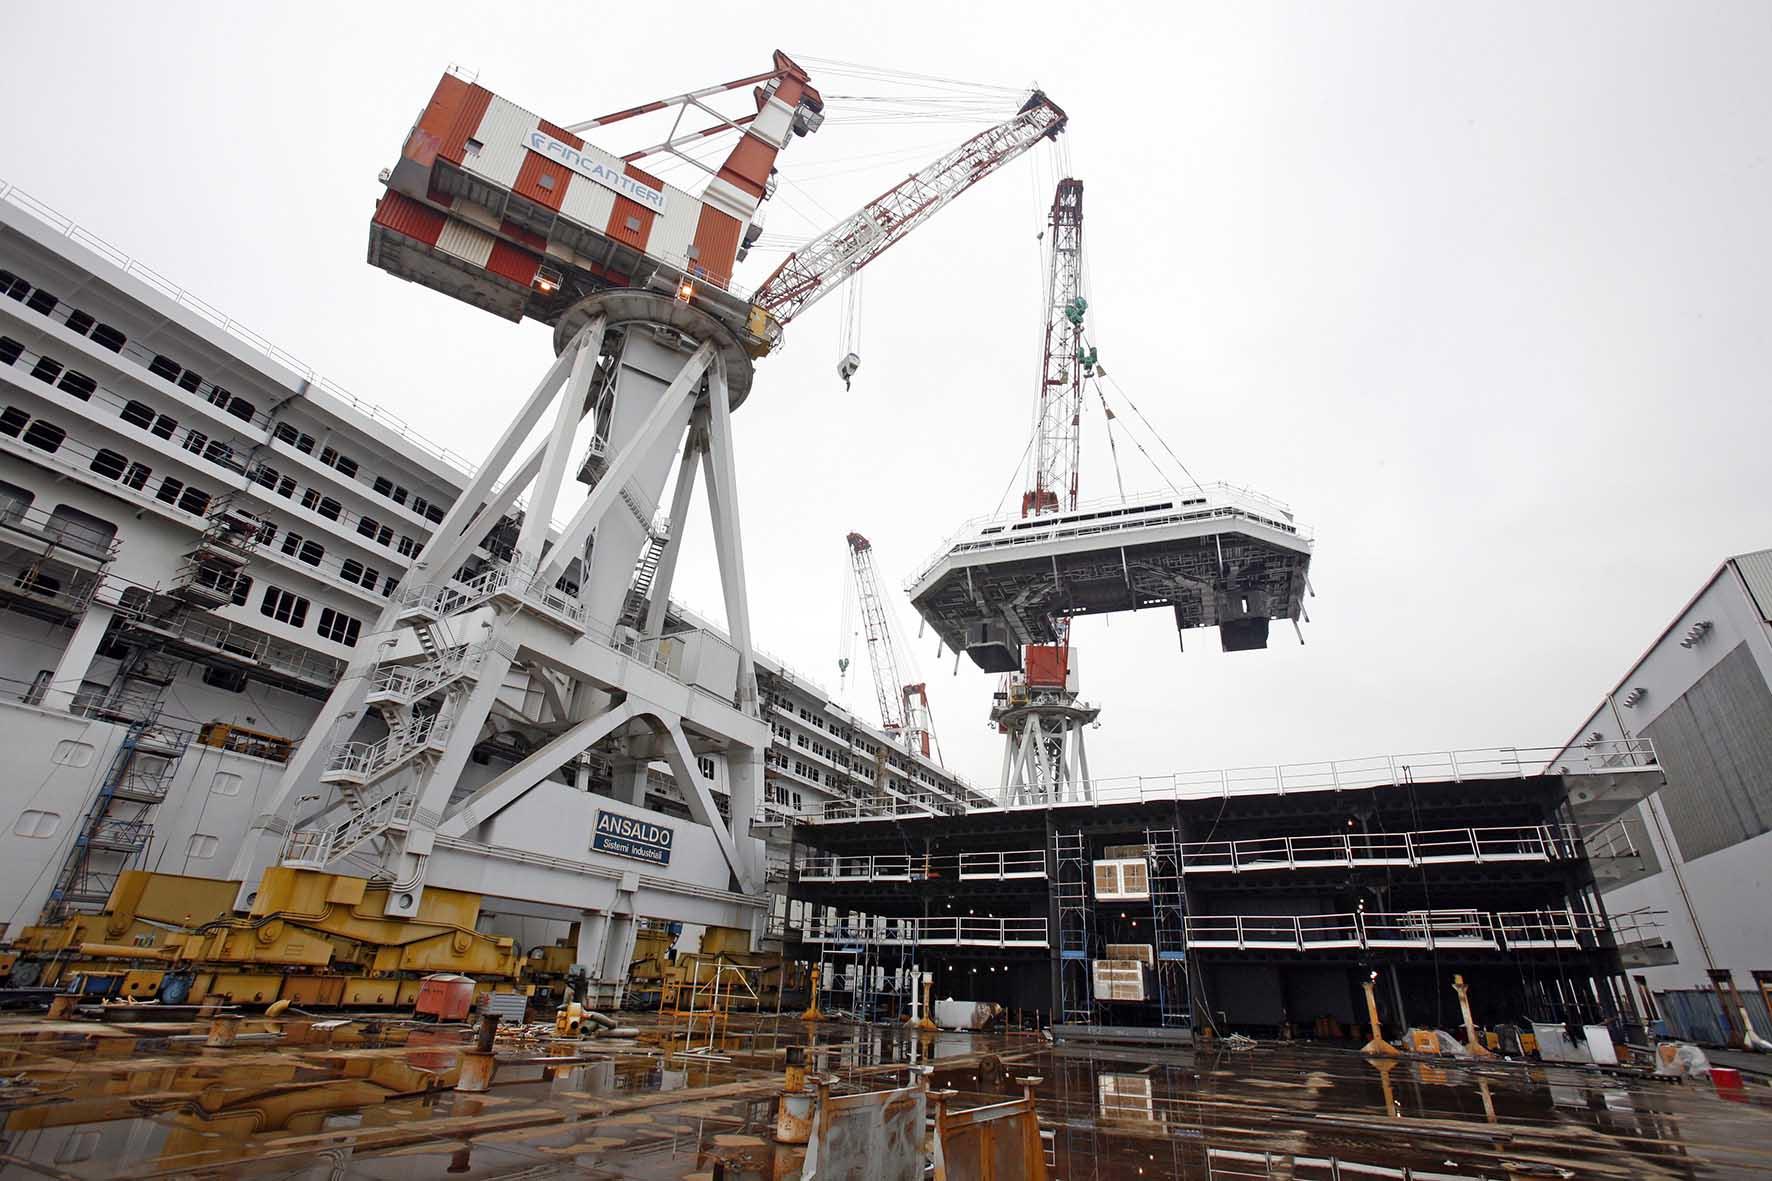 fincantieri costruzione navale 4